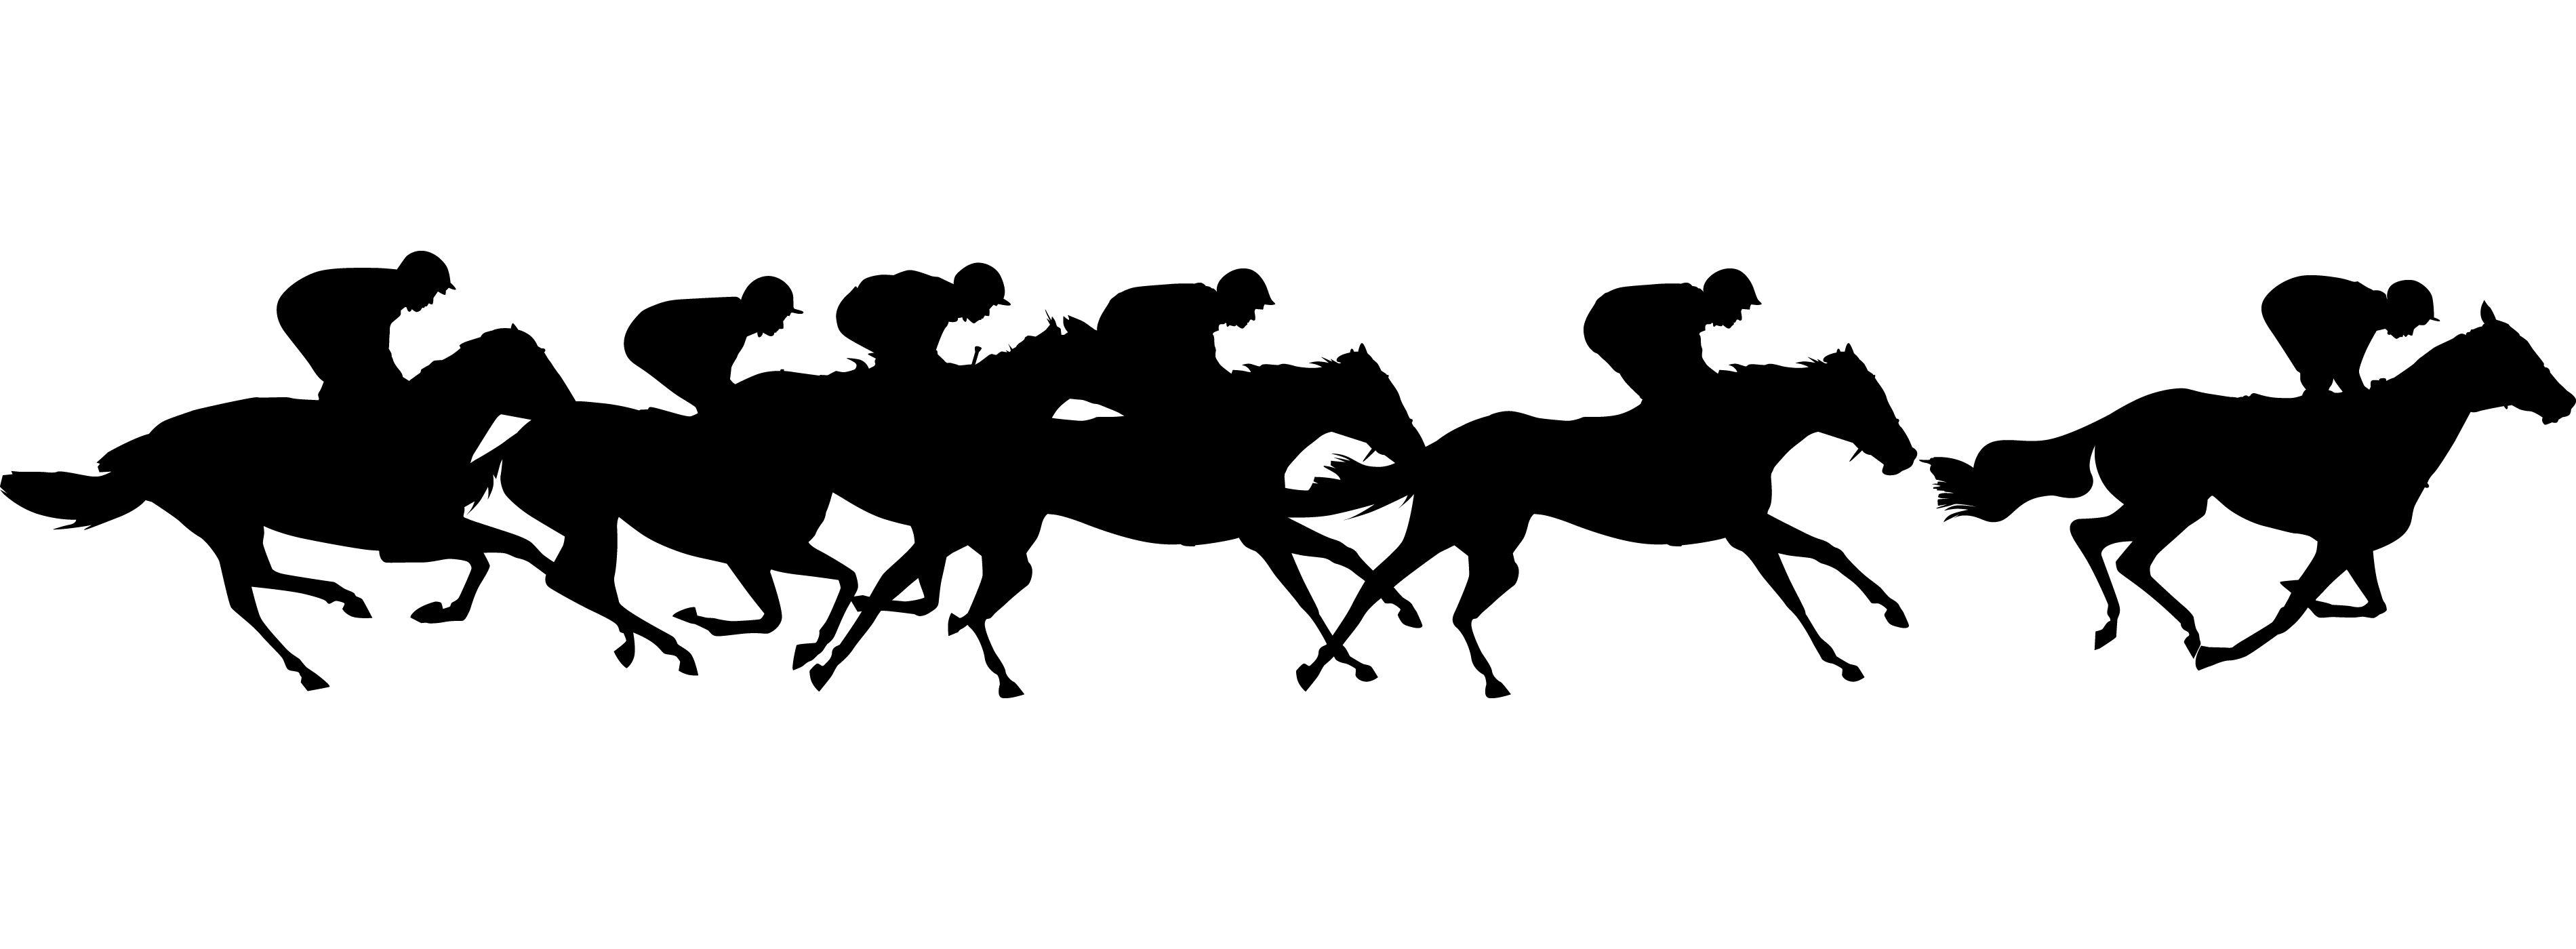 3800x1400 image | Horse tattoo, St tropez spray tan, Horse ...